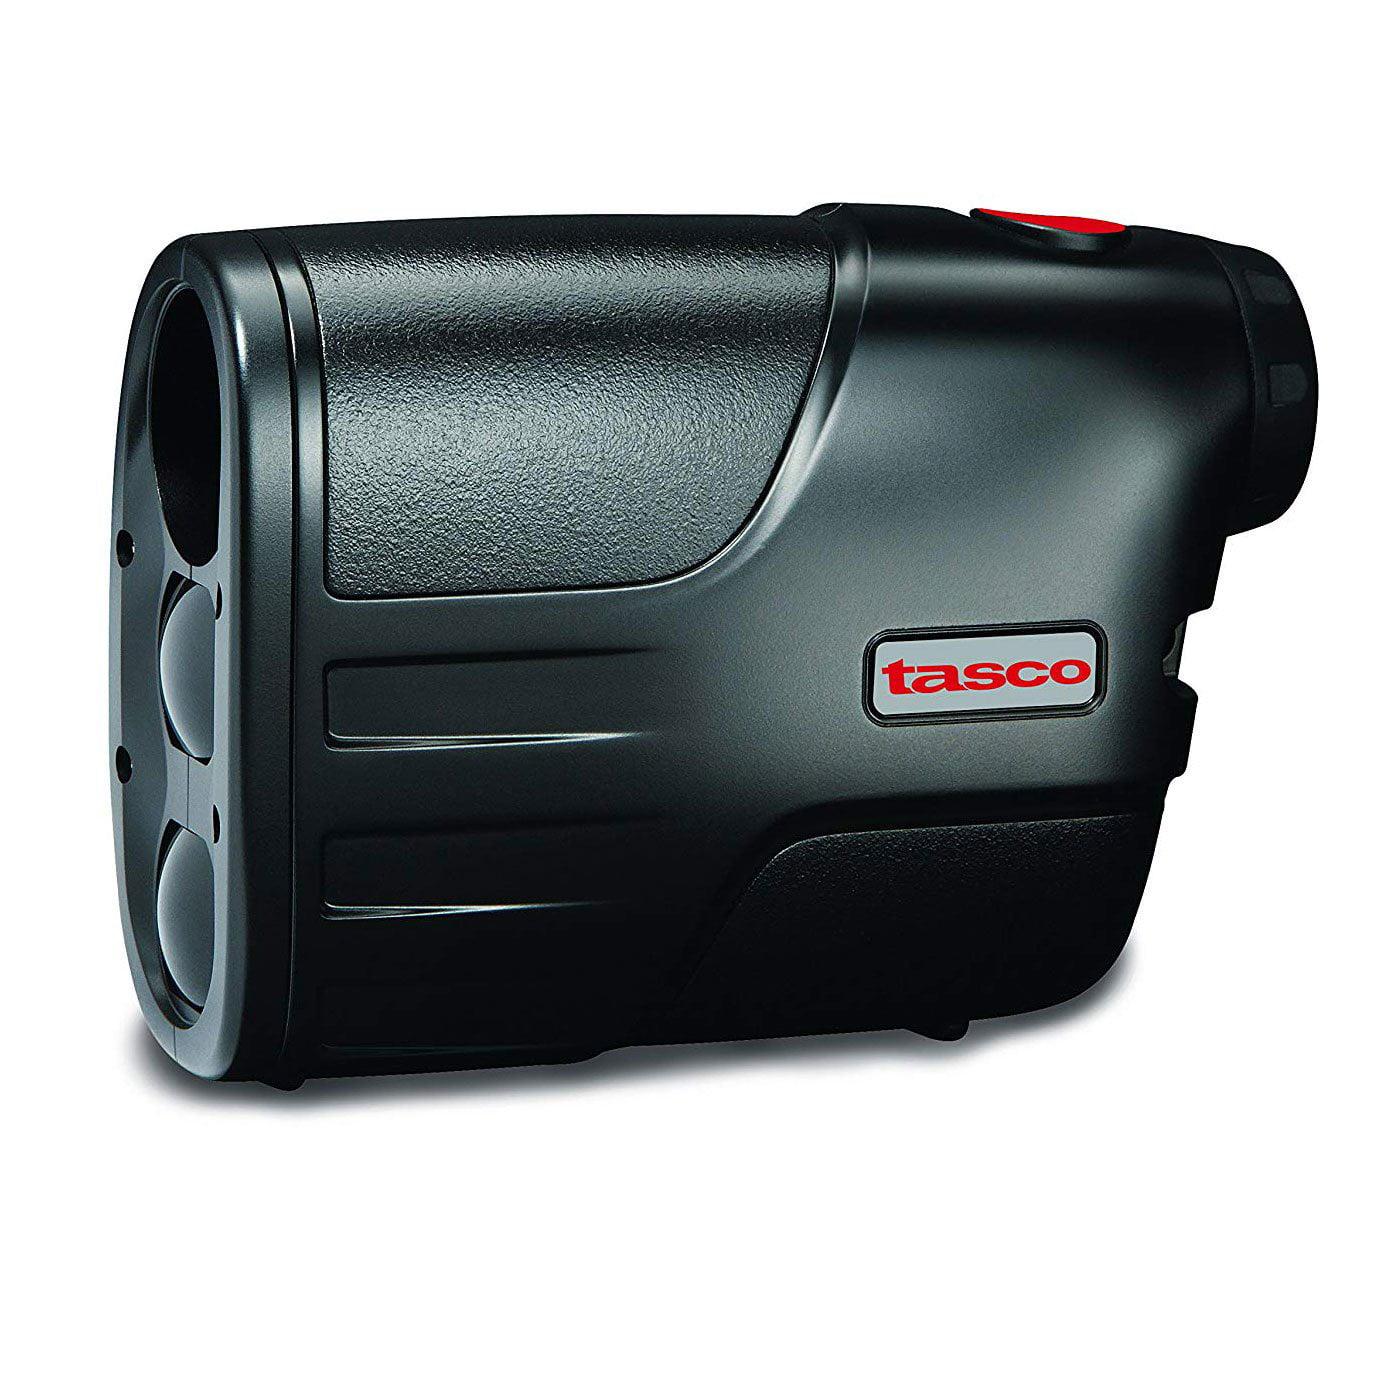 Tasco VLRF600 Performance Magnifying LCD Golf Distance Laser Rangefinder, Black